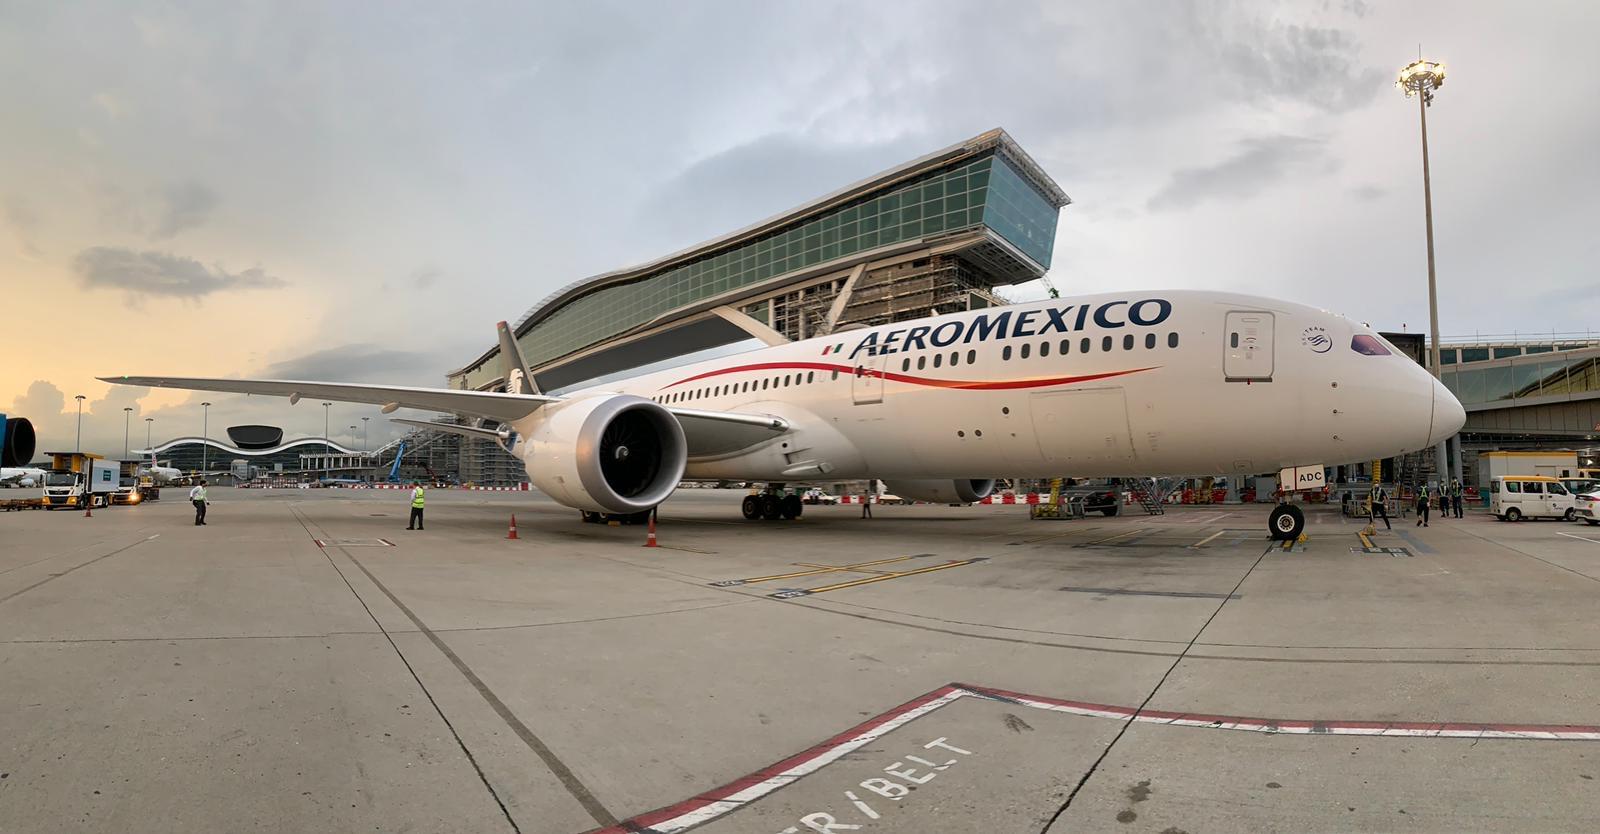 Aeroméxico rompe récord con el vuelo más largo de aviación mexicana